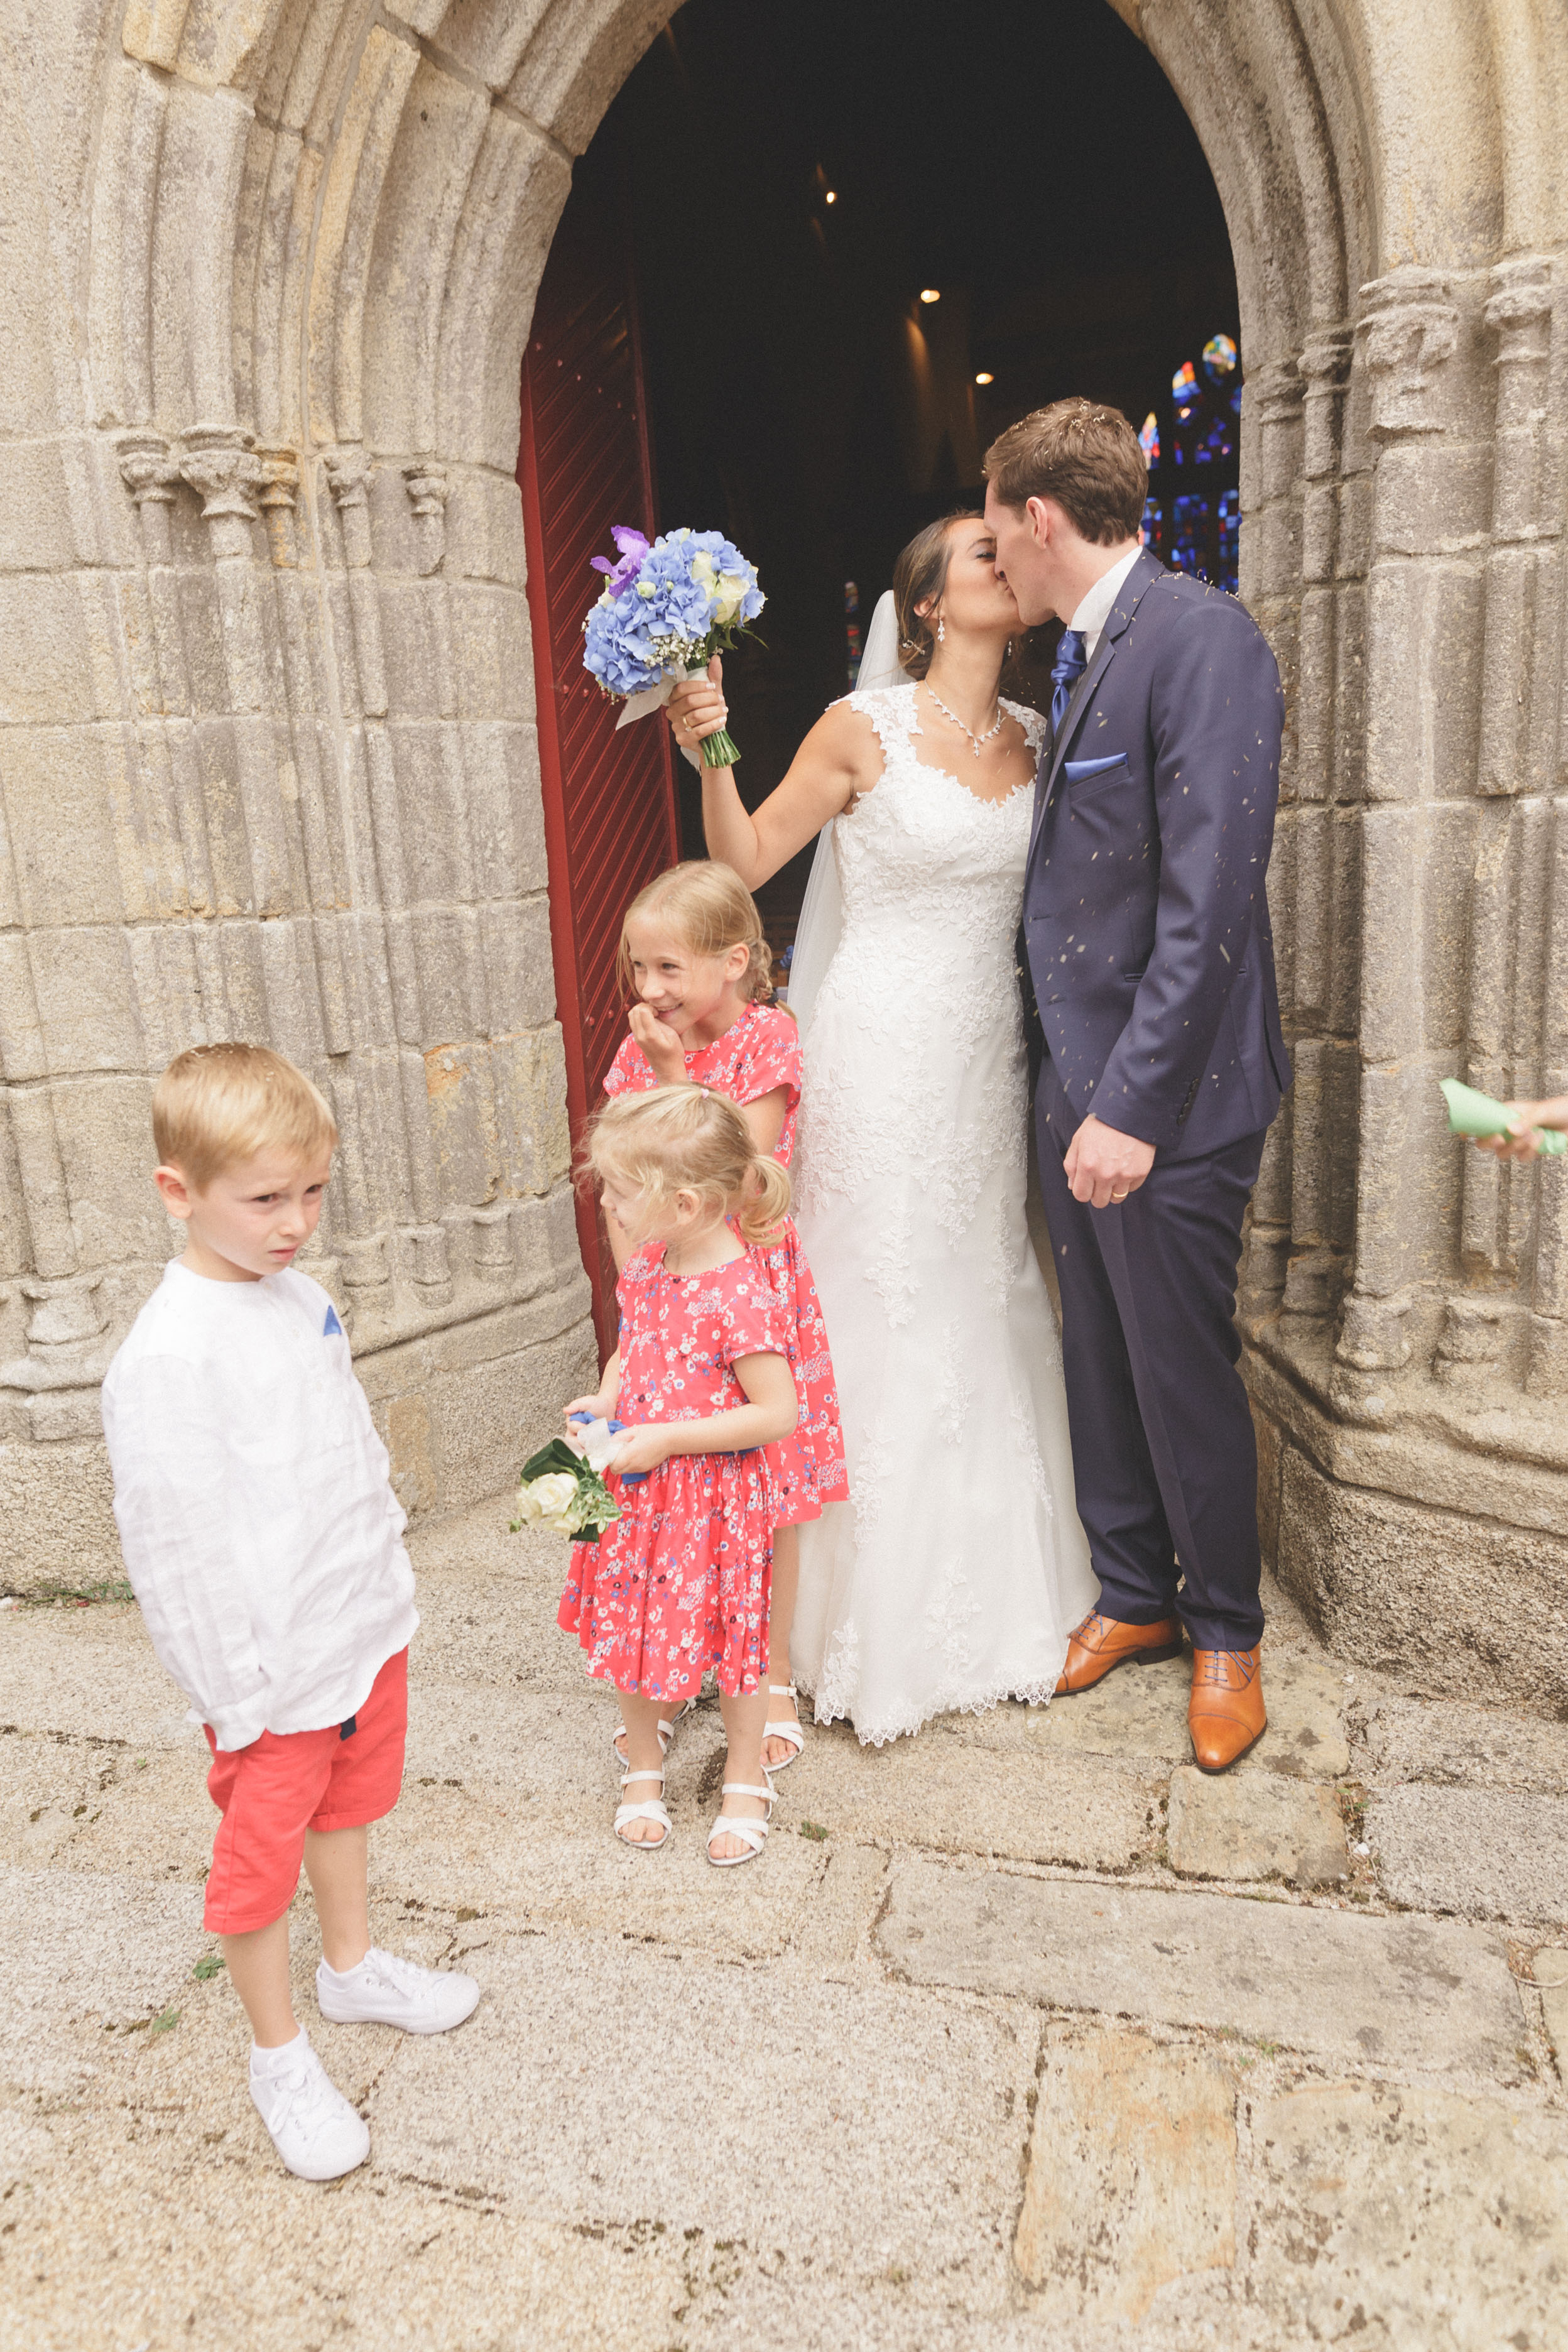 Photographie - Mariage - Bretagne - Finistere - Morbihan - Lilian Vezin Photographie (23)